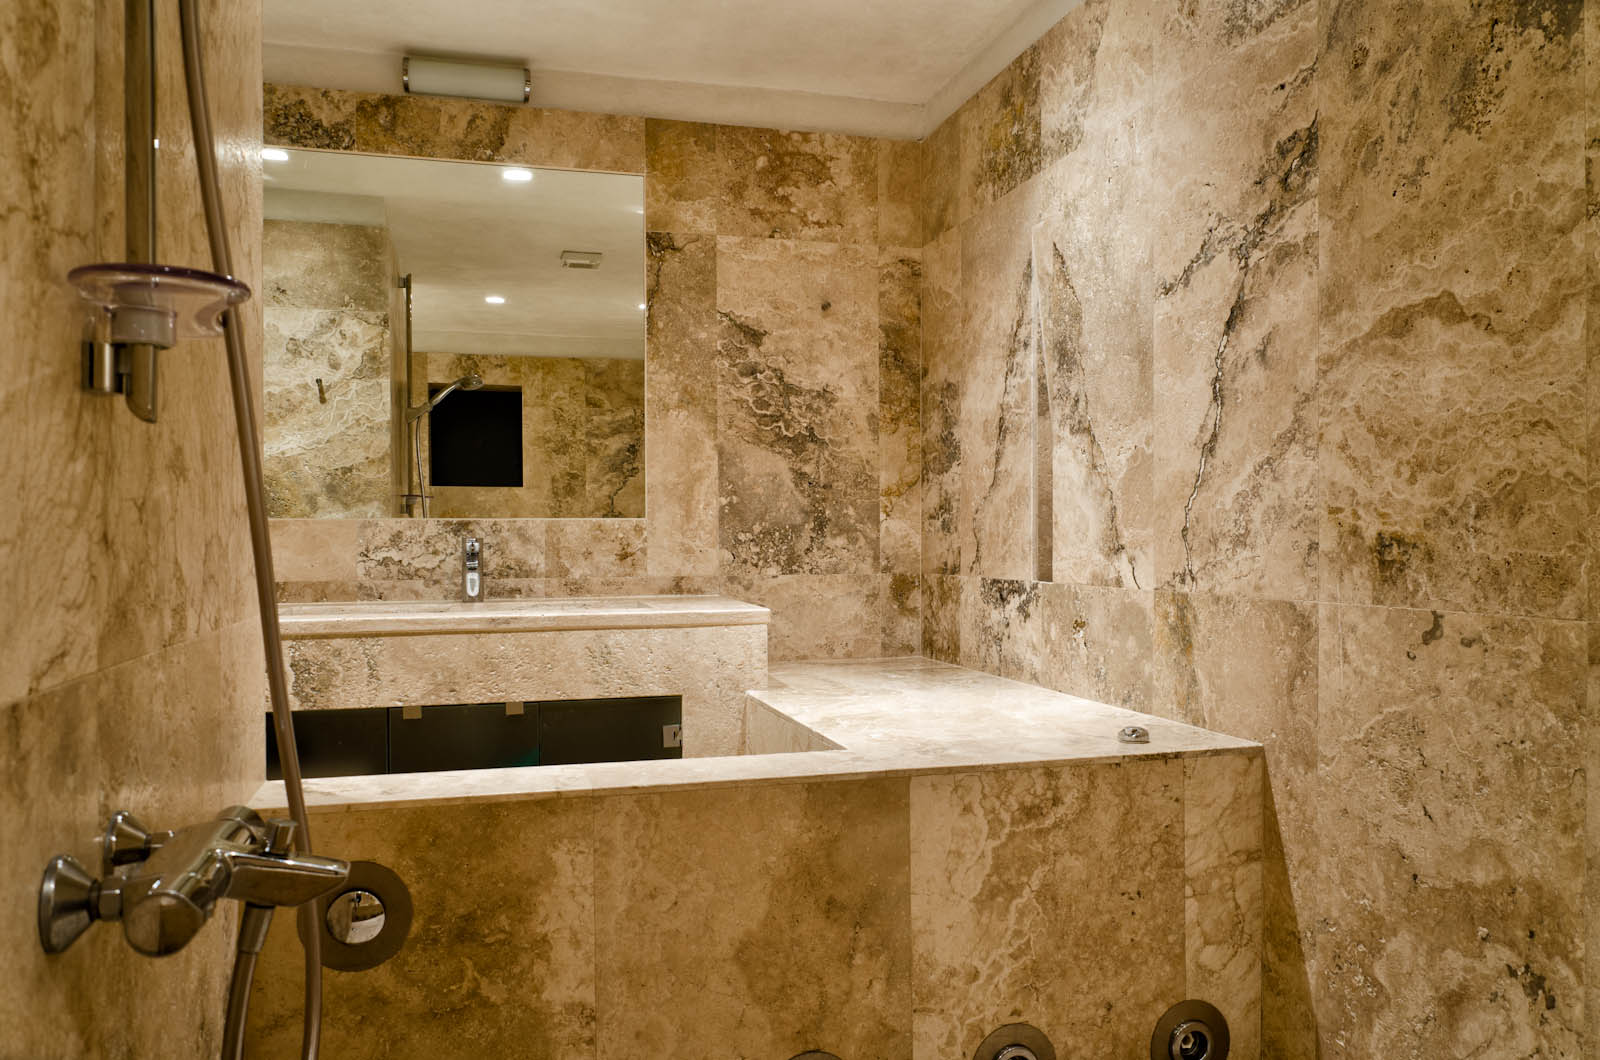 Villa waddell in fiesole toskana naturstein - Pietra per bagno ...